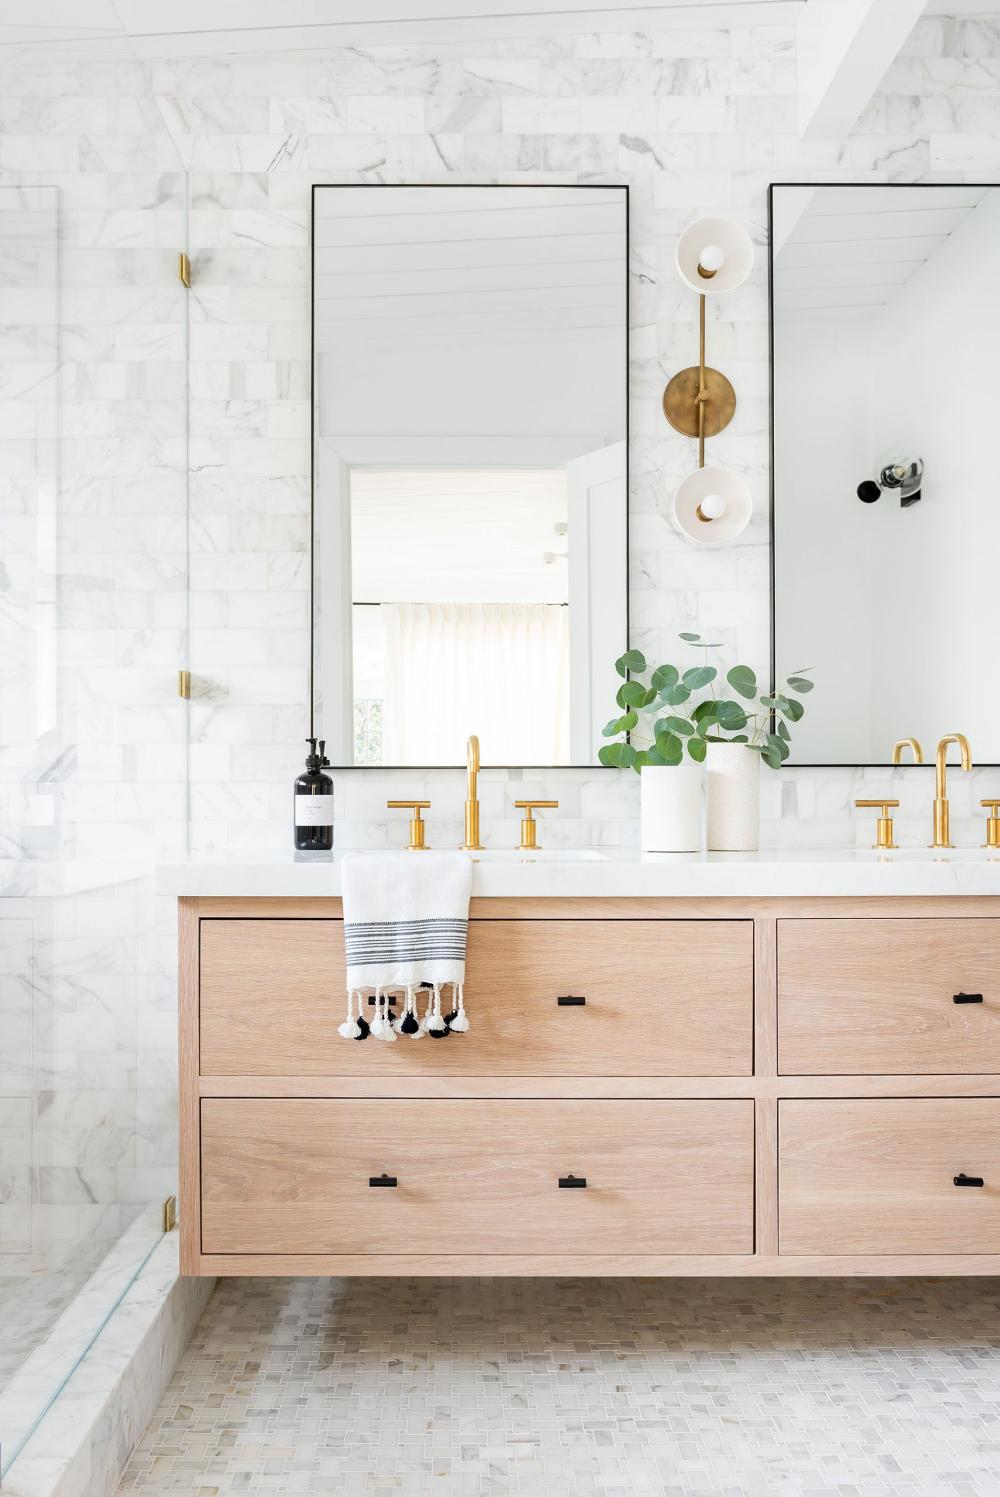 5 Ways To Make Your Home Feel Custom Studio Mcgee Bathroom Inspiration Bathroom Design Bathroom Interior